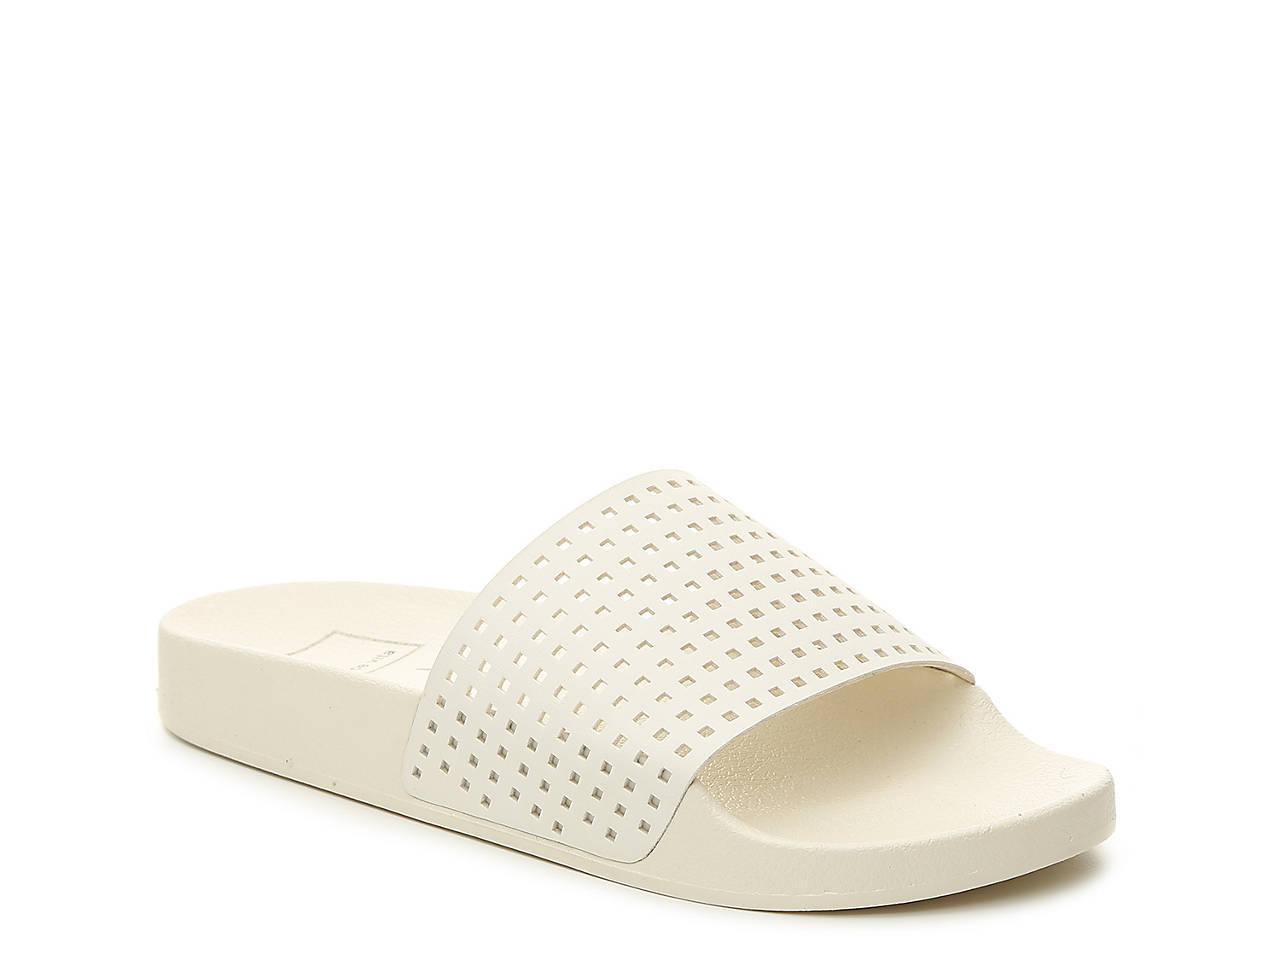 fc3d0346c Dolce Vita Tony Slide Sandal Women's Shoes | DSW